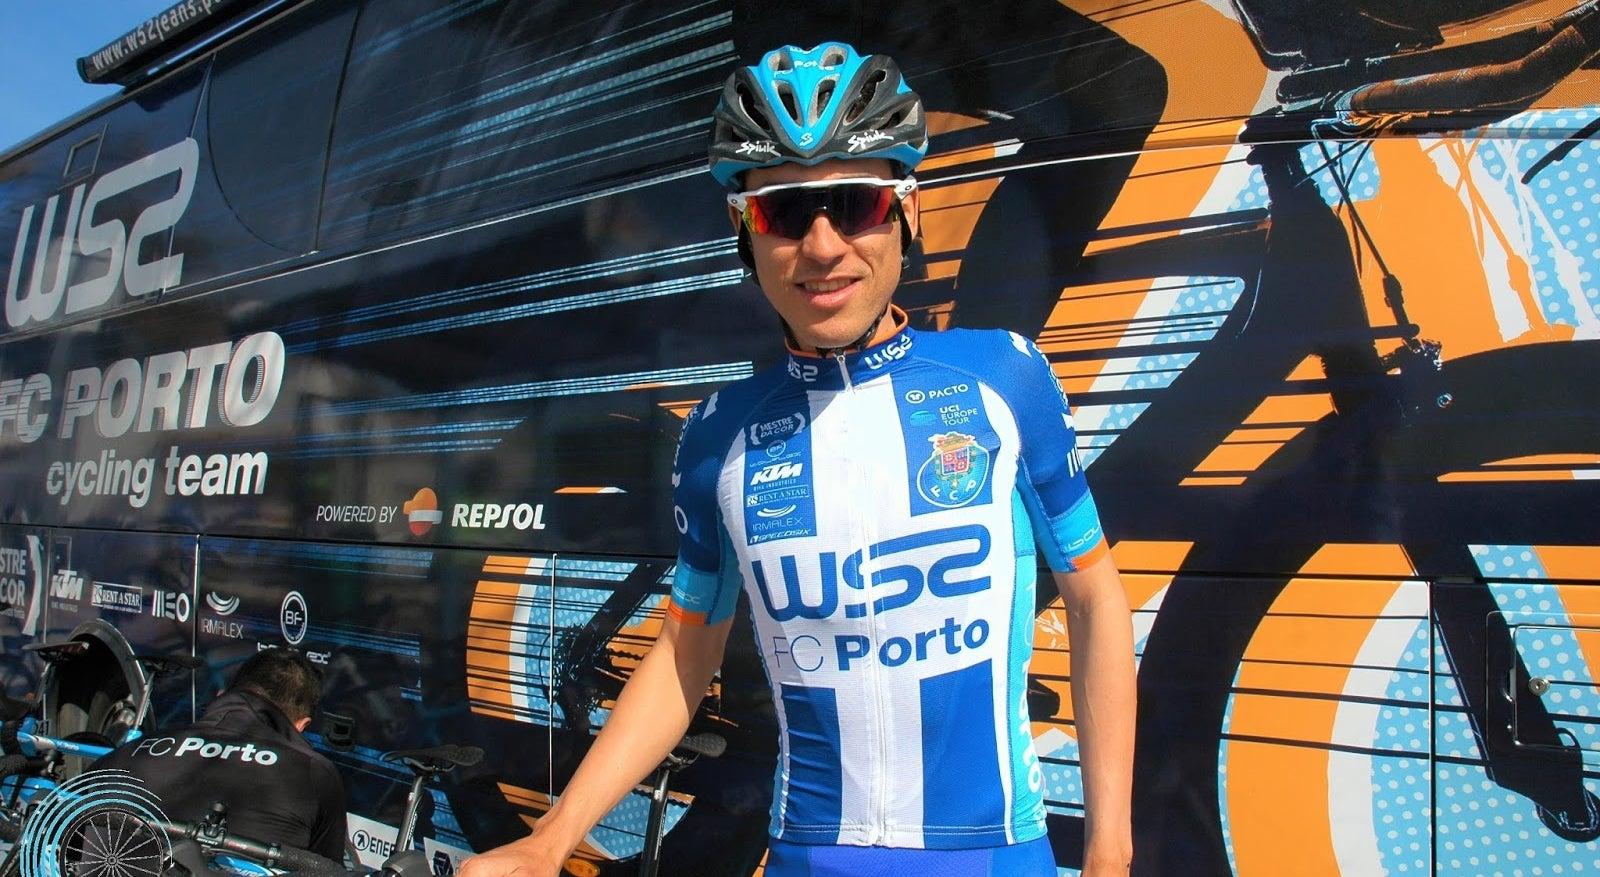 Amaro Antunes lidera tabela do ciclista do ano